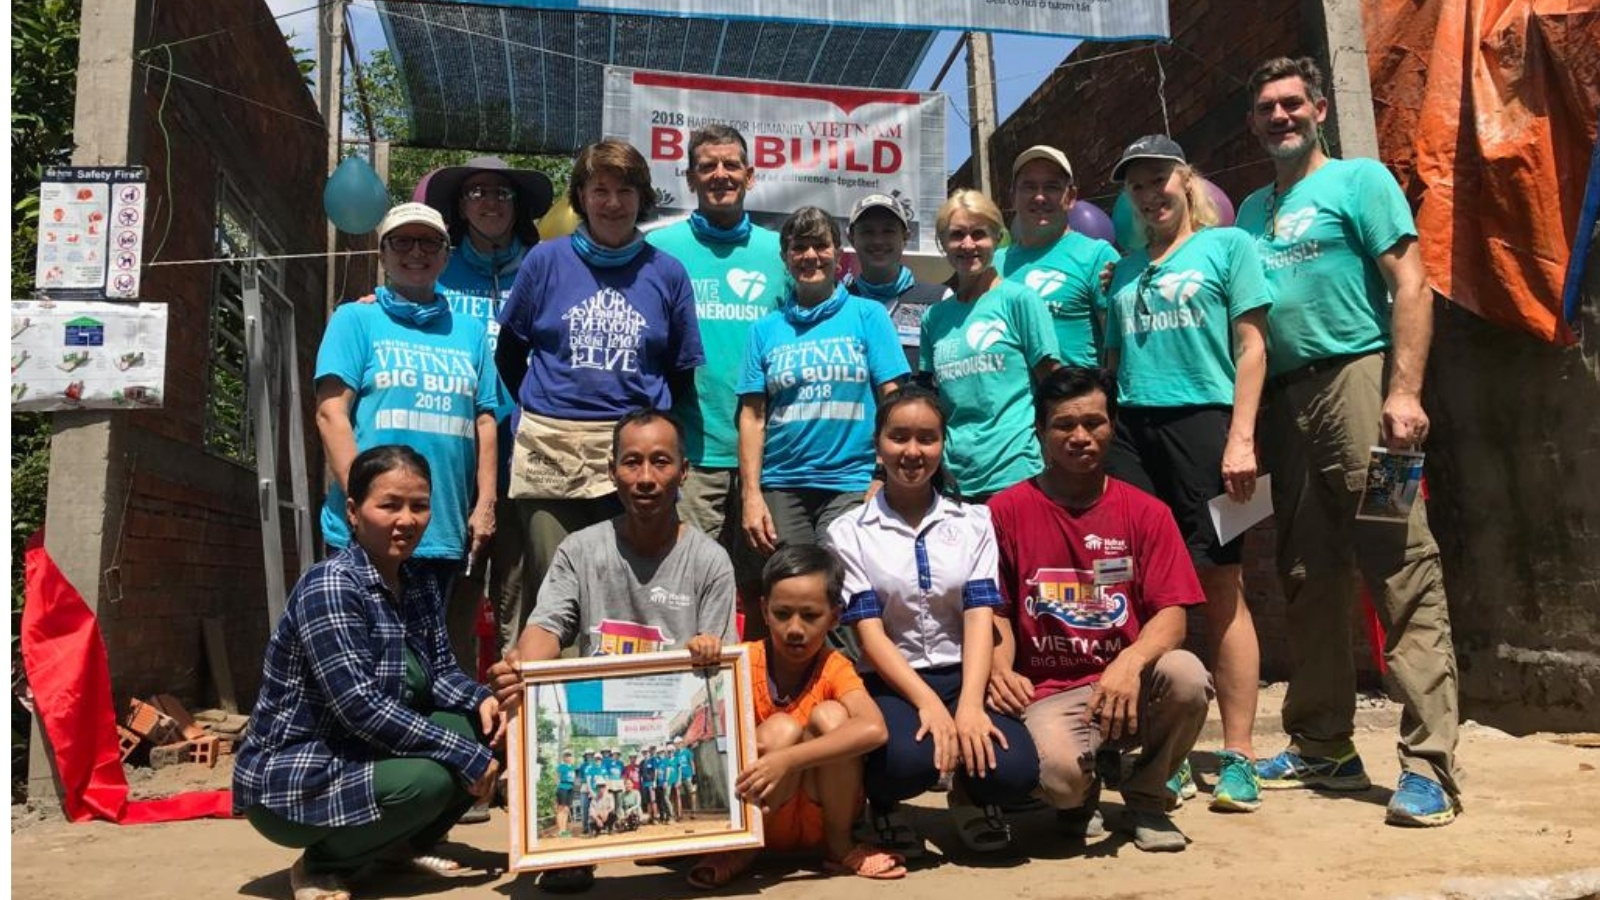 Vietnam Global Village Build 2018 Group Photo